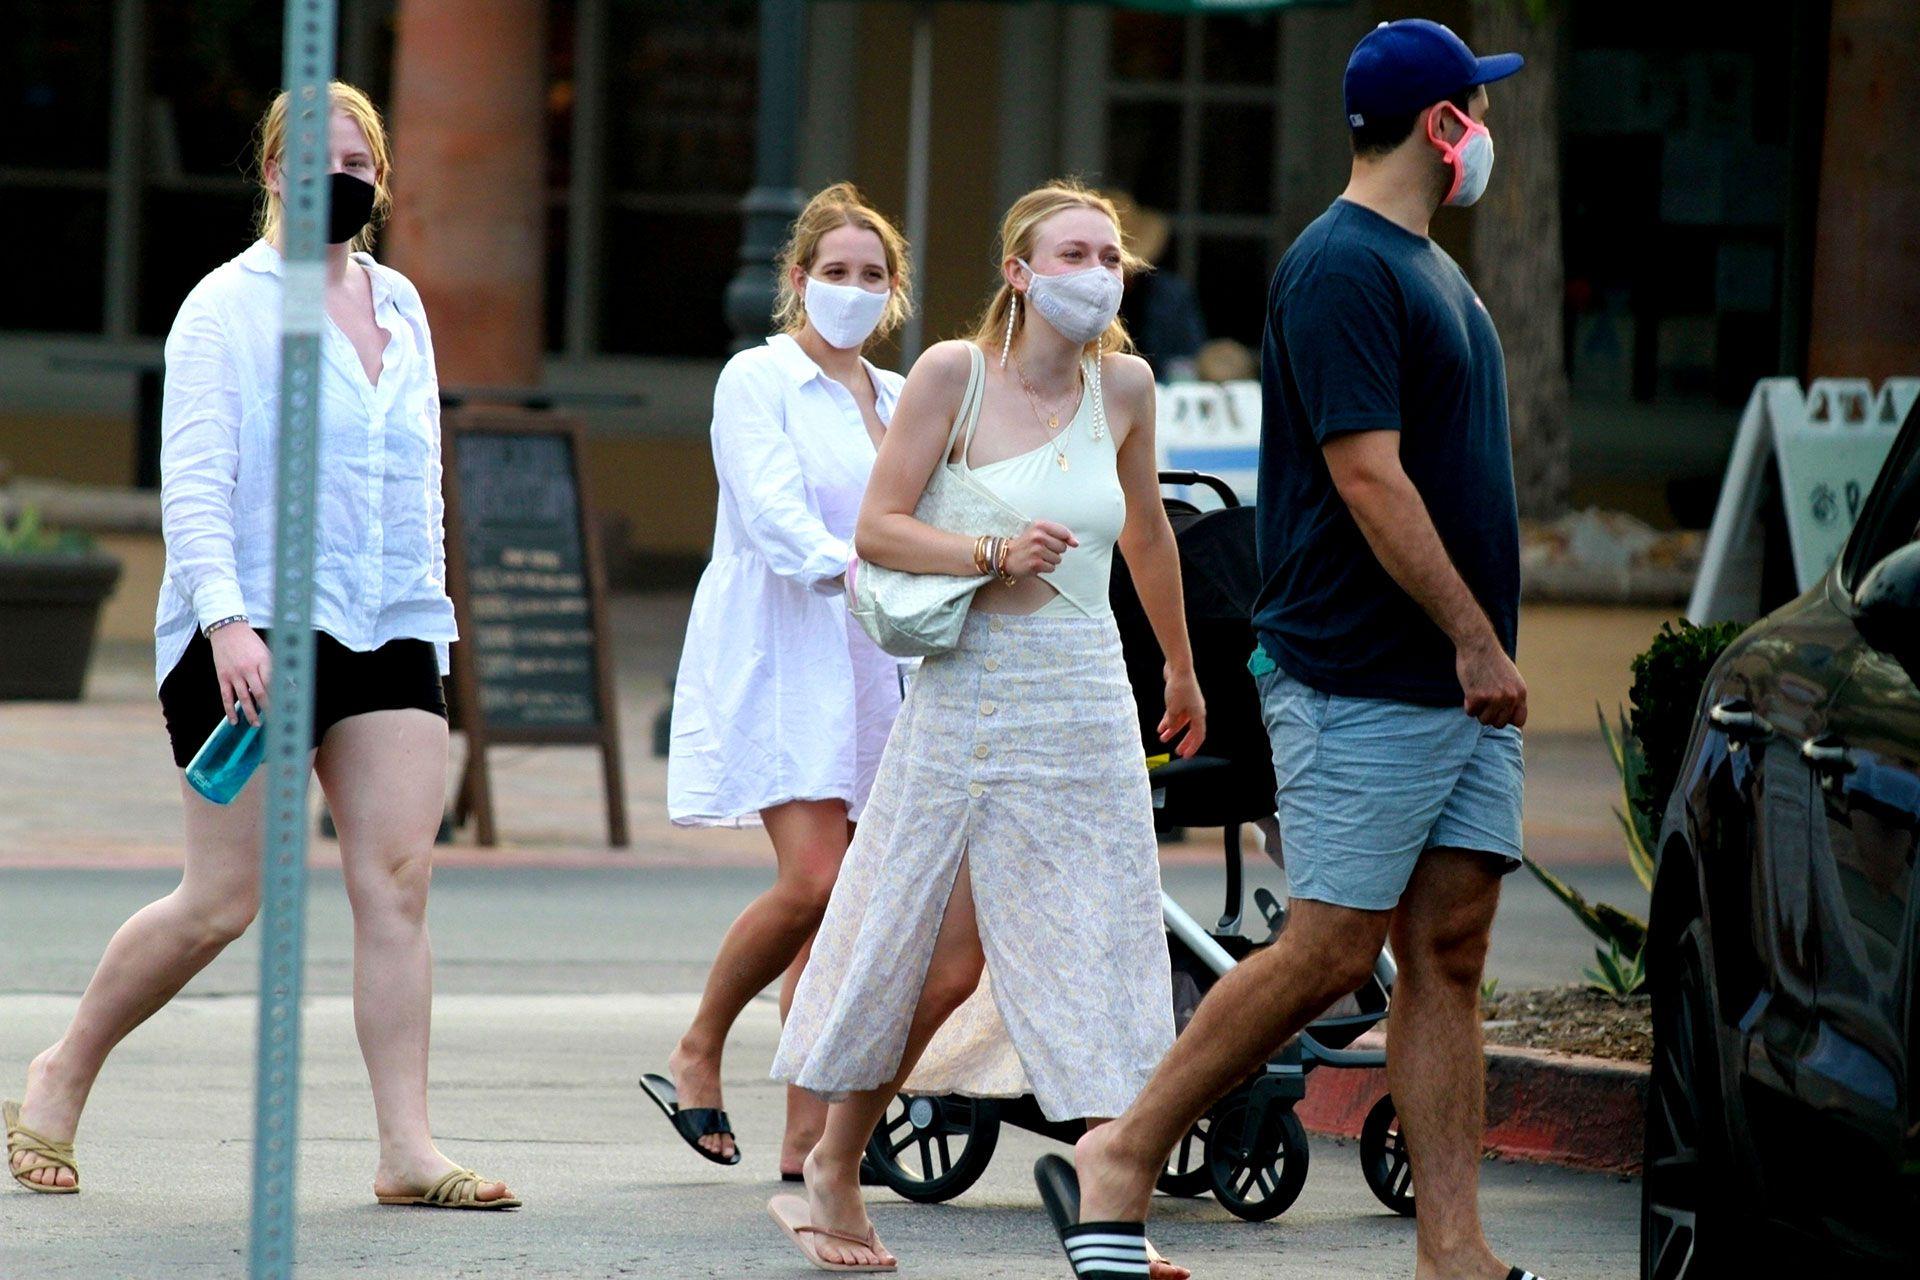 Celebrities-en-un-clic-Dakota-Fanning-08102020